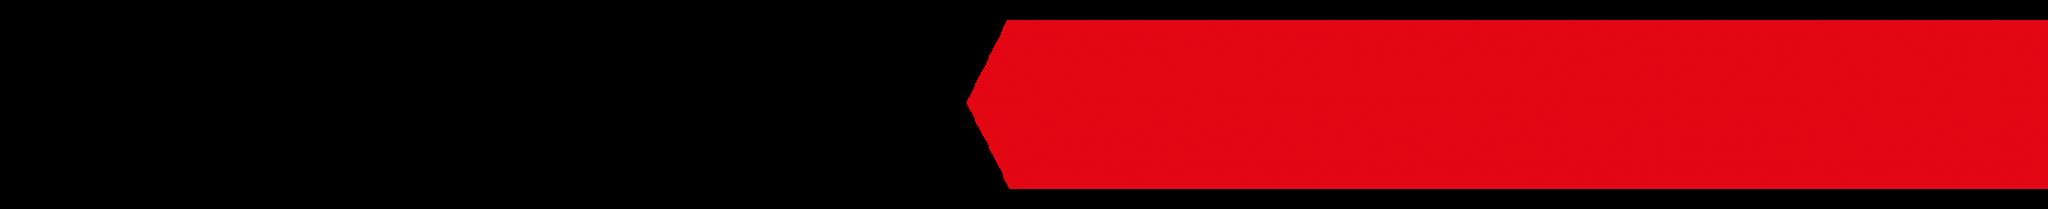 SCHWENK Latvija